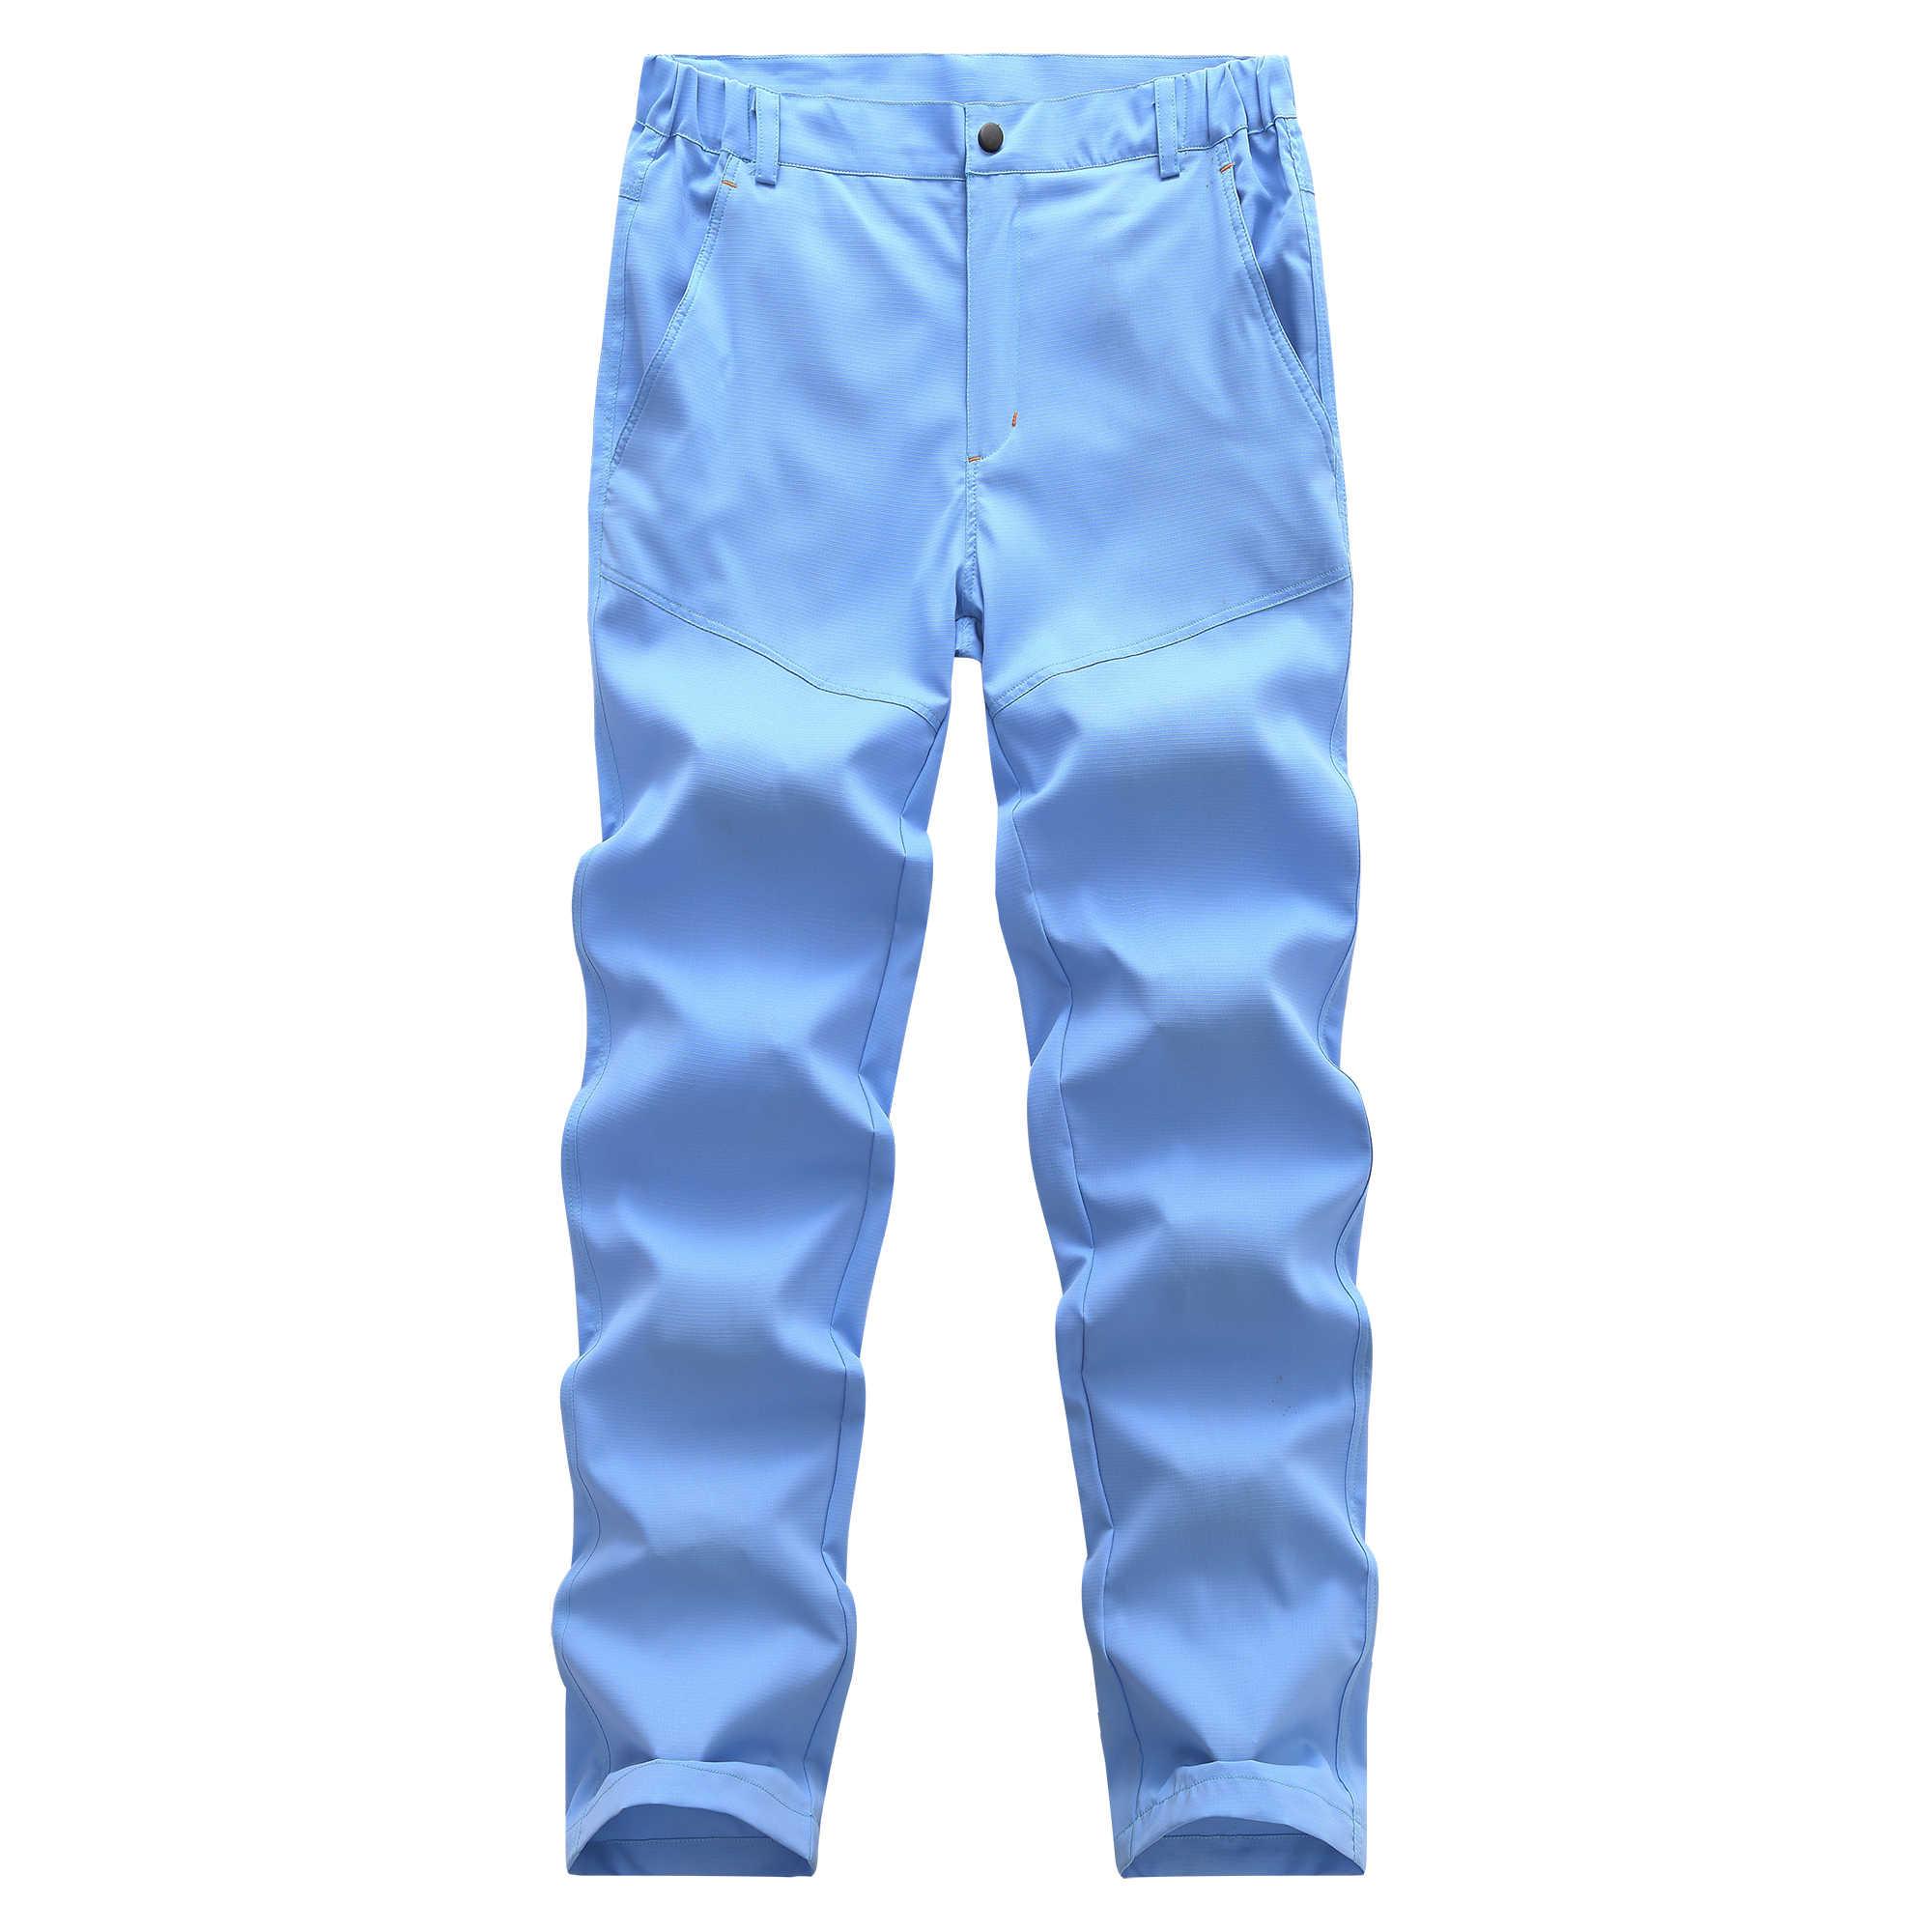 Impermeable Softshell invierno senderismo pantalones hombres Camping Trekking térmico polar cálido esquí pantalones mujeres de talla grande Polartec Pantalones